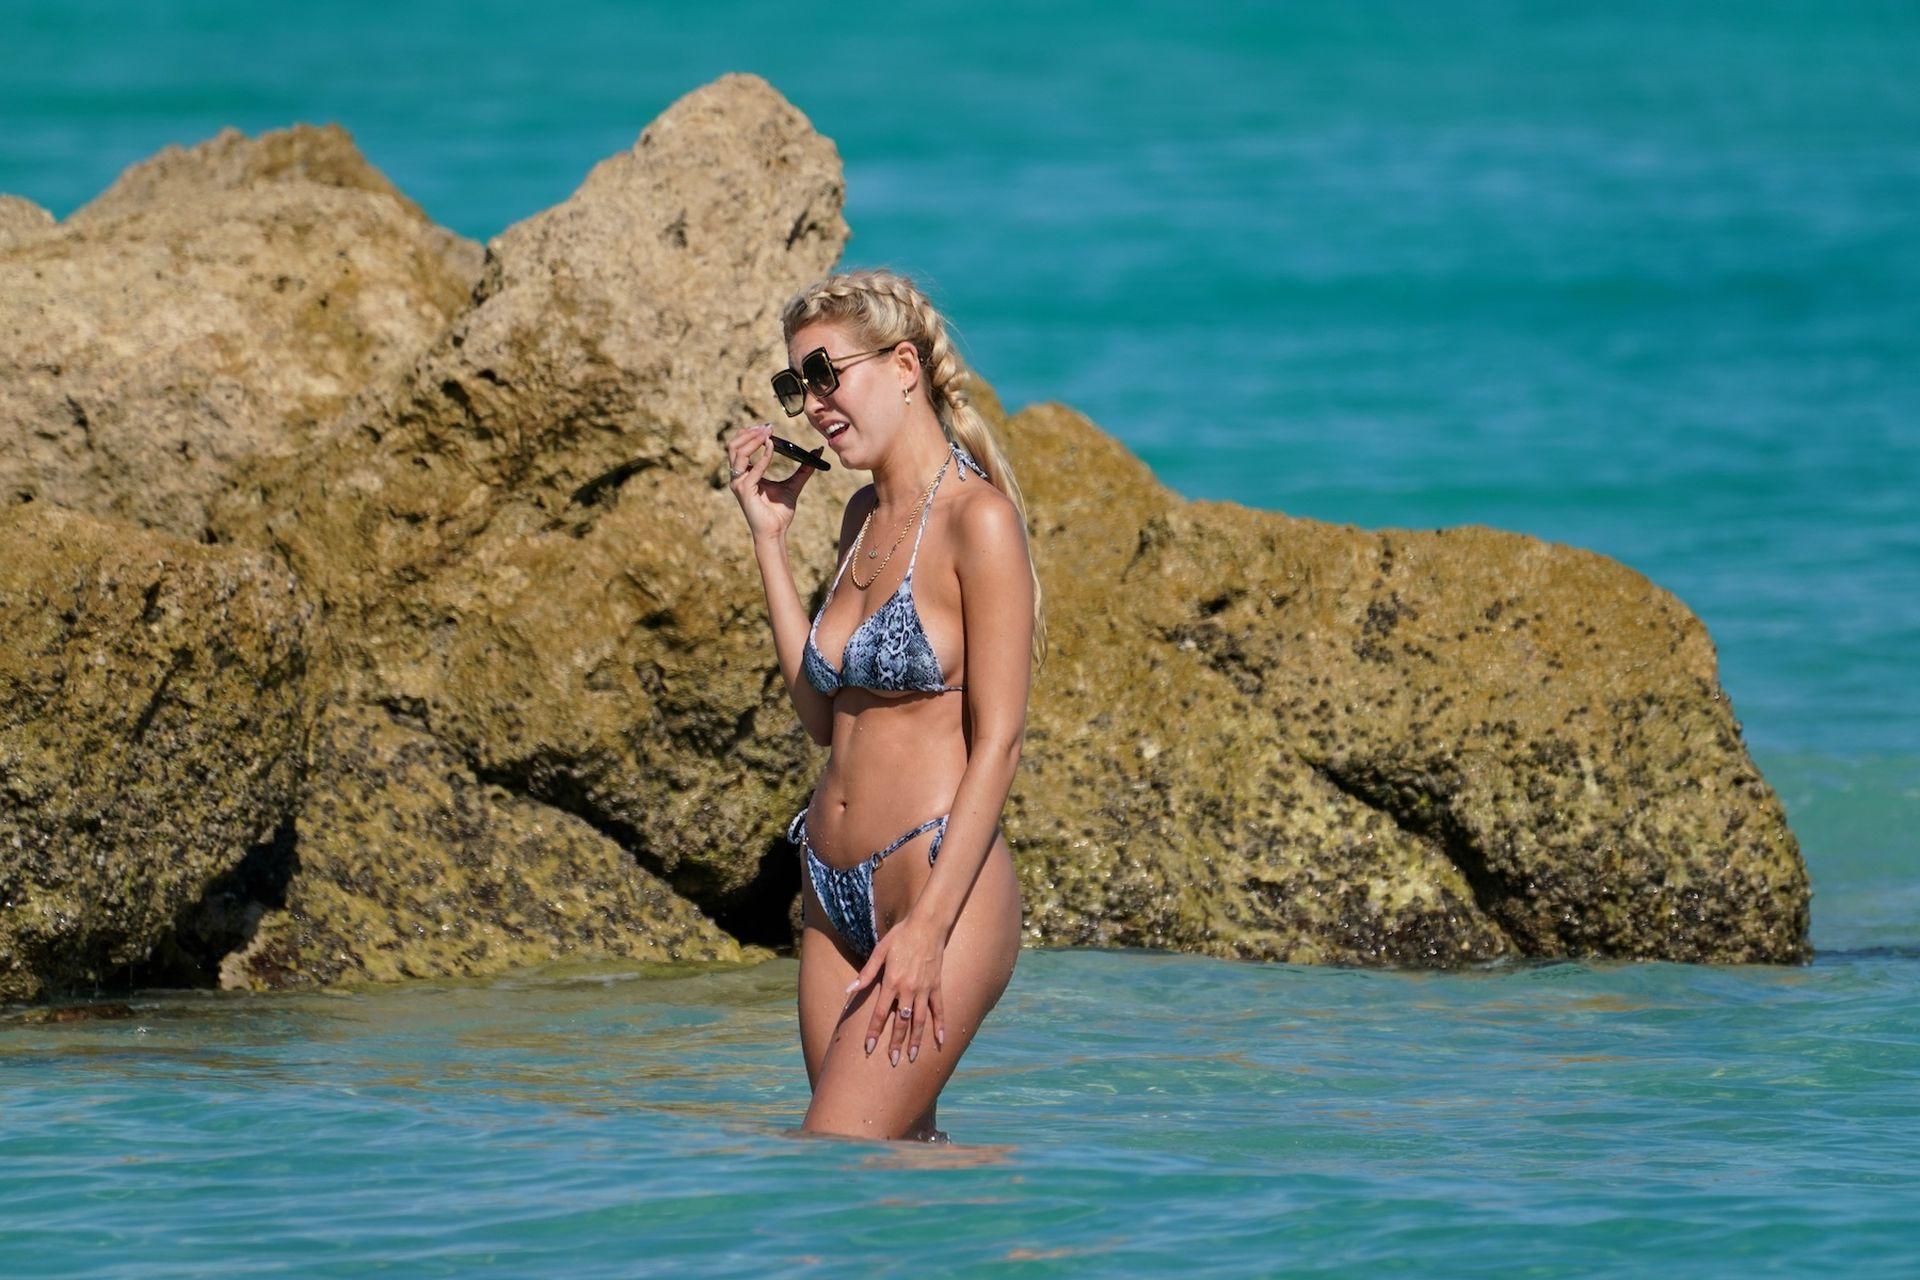 Chealse Sophia Howell Shows A Thong Bikini At The Beach In Miami 0011